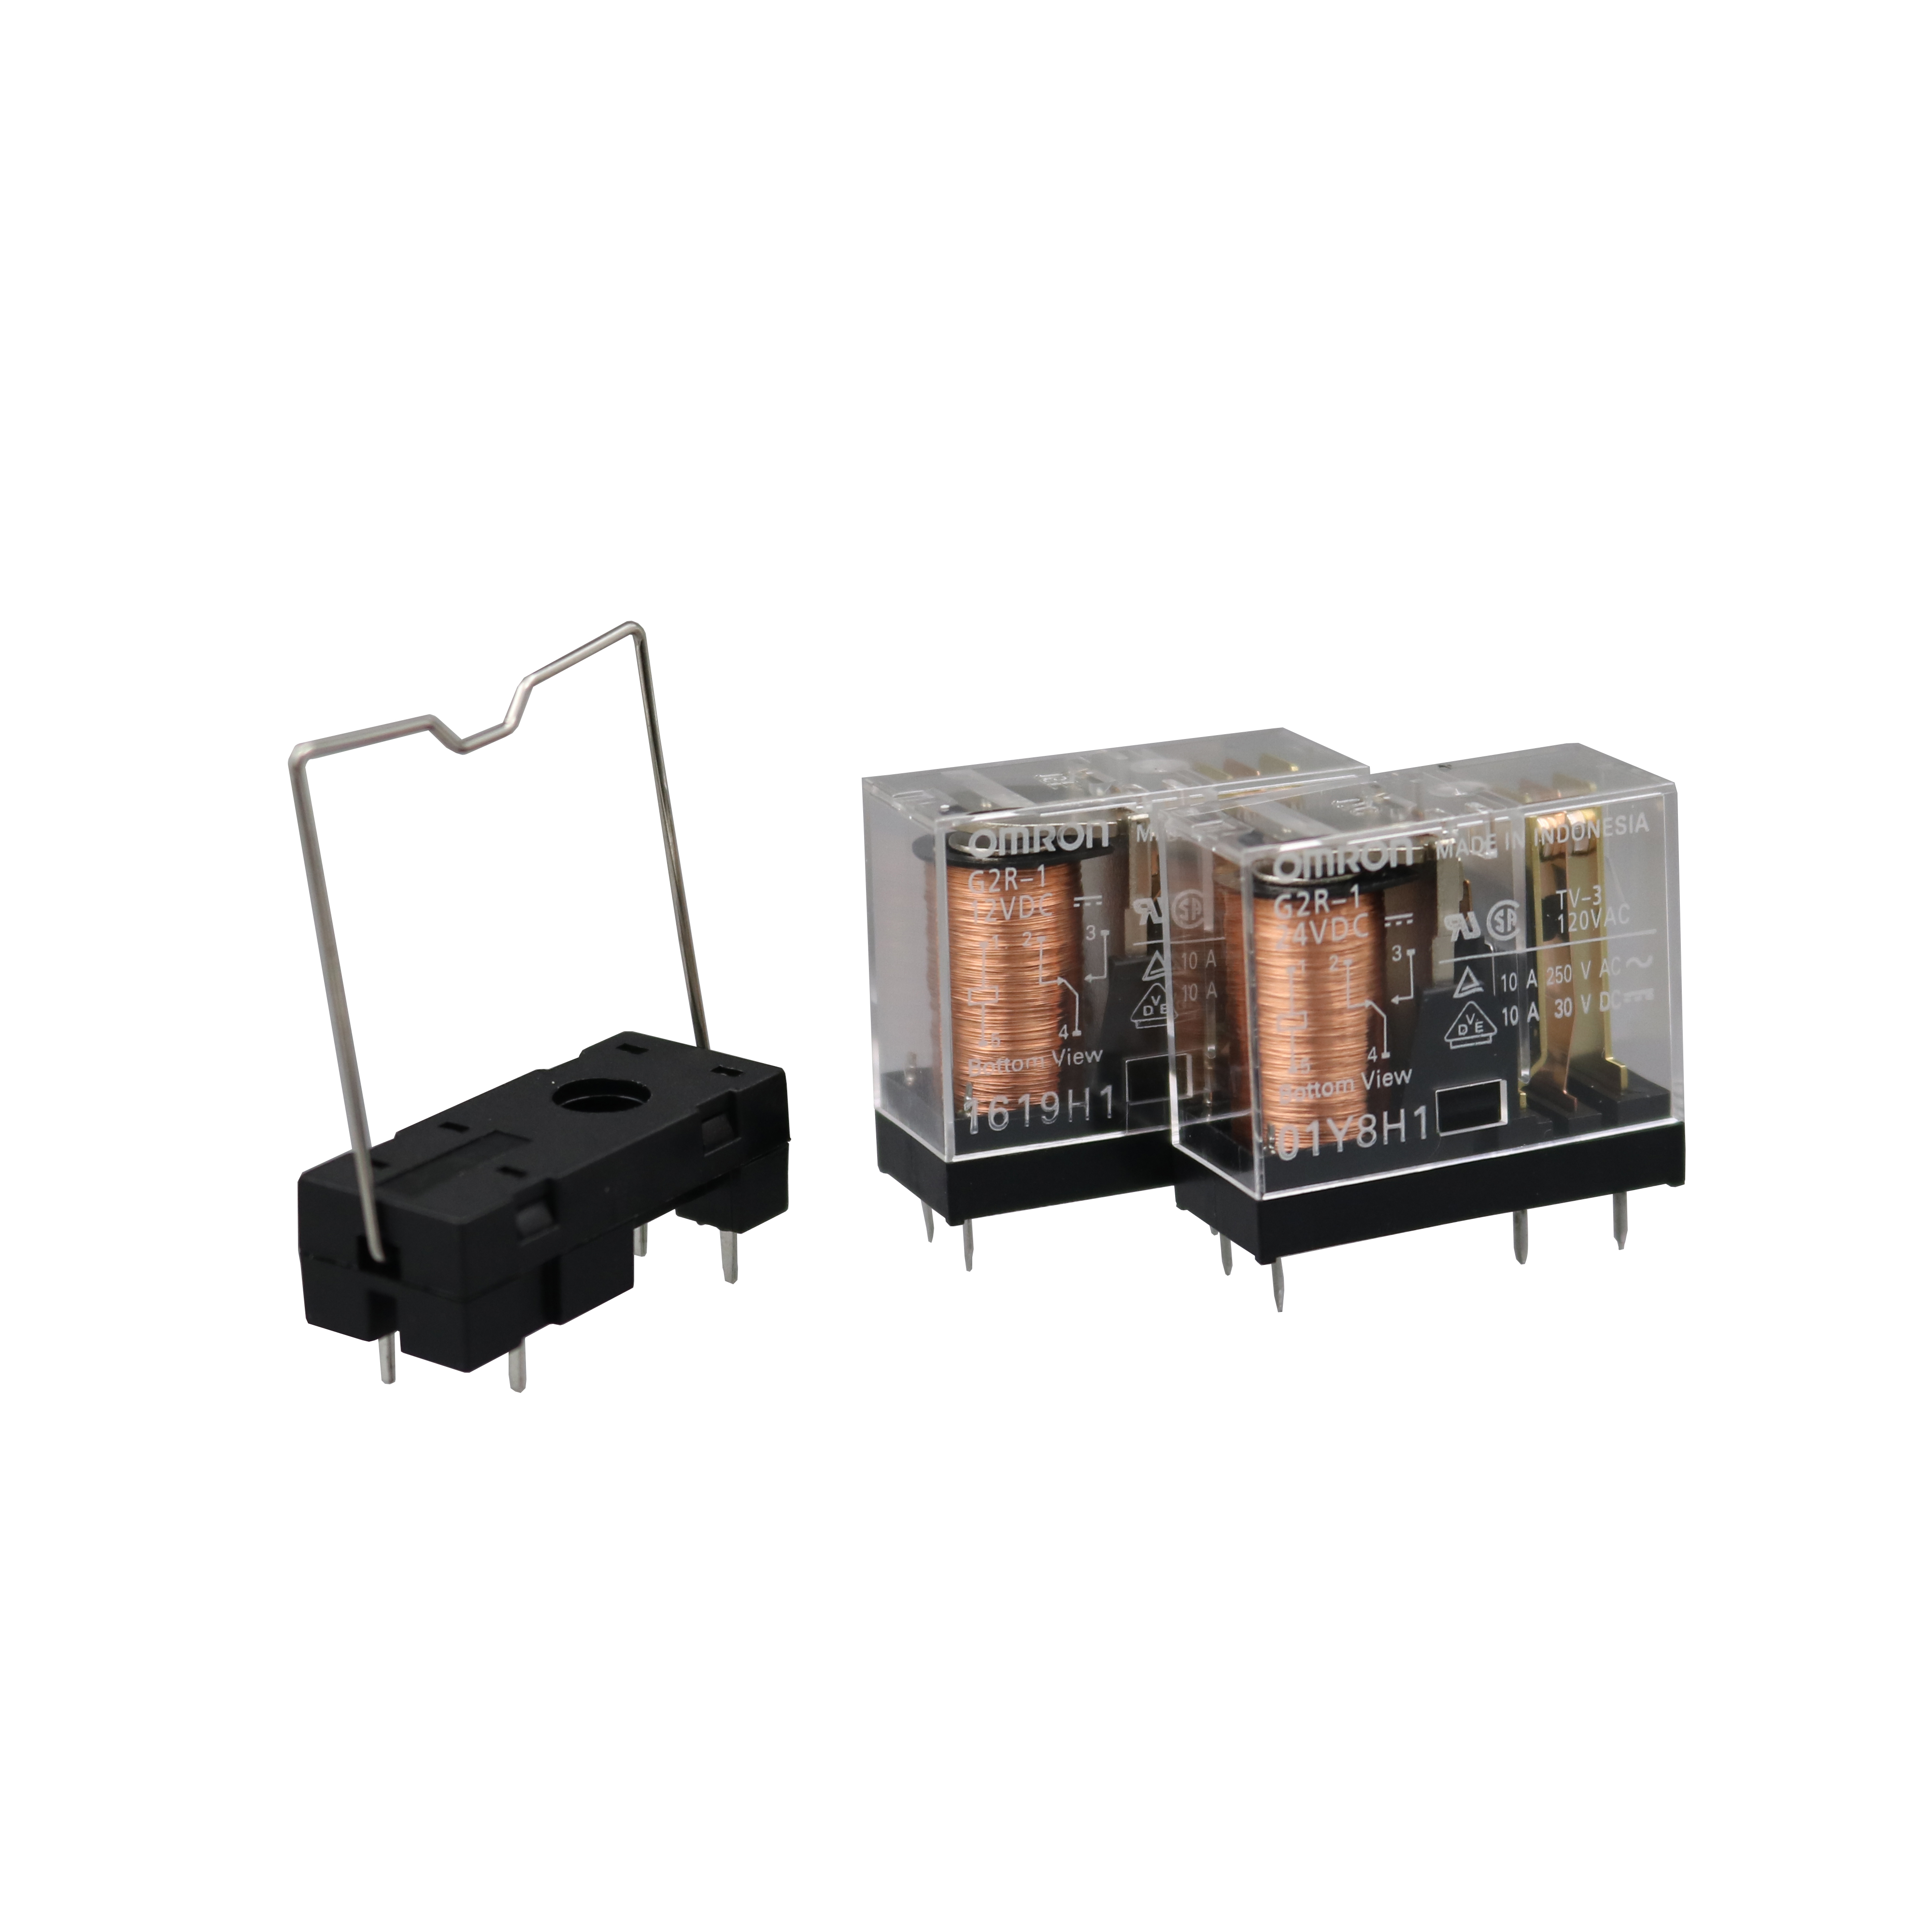 1pcs G2R-1A-E-24VDC G2R-1A-E-DC24 POWER RELAY 24VDC 16A SPST 6PIN Tranparent